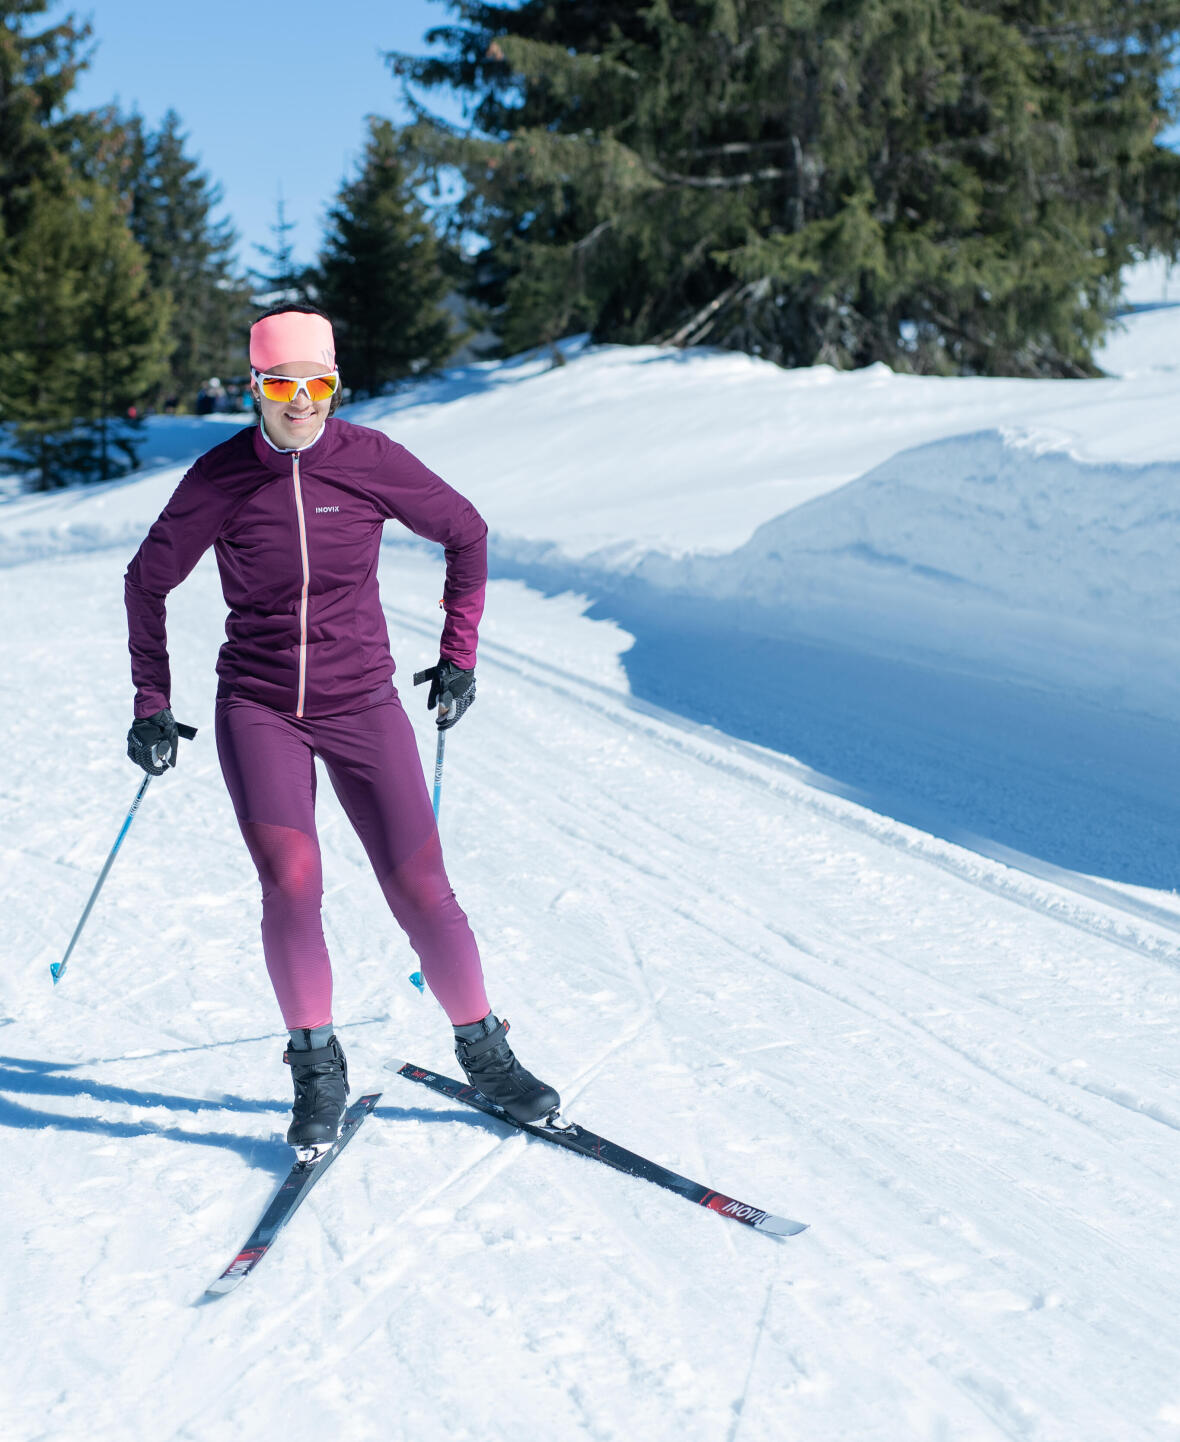 woman cross-country-skiing race